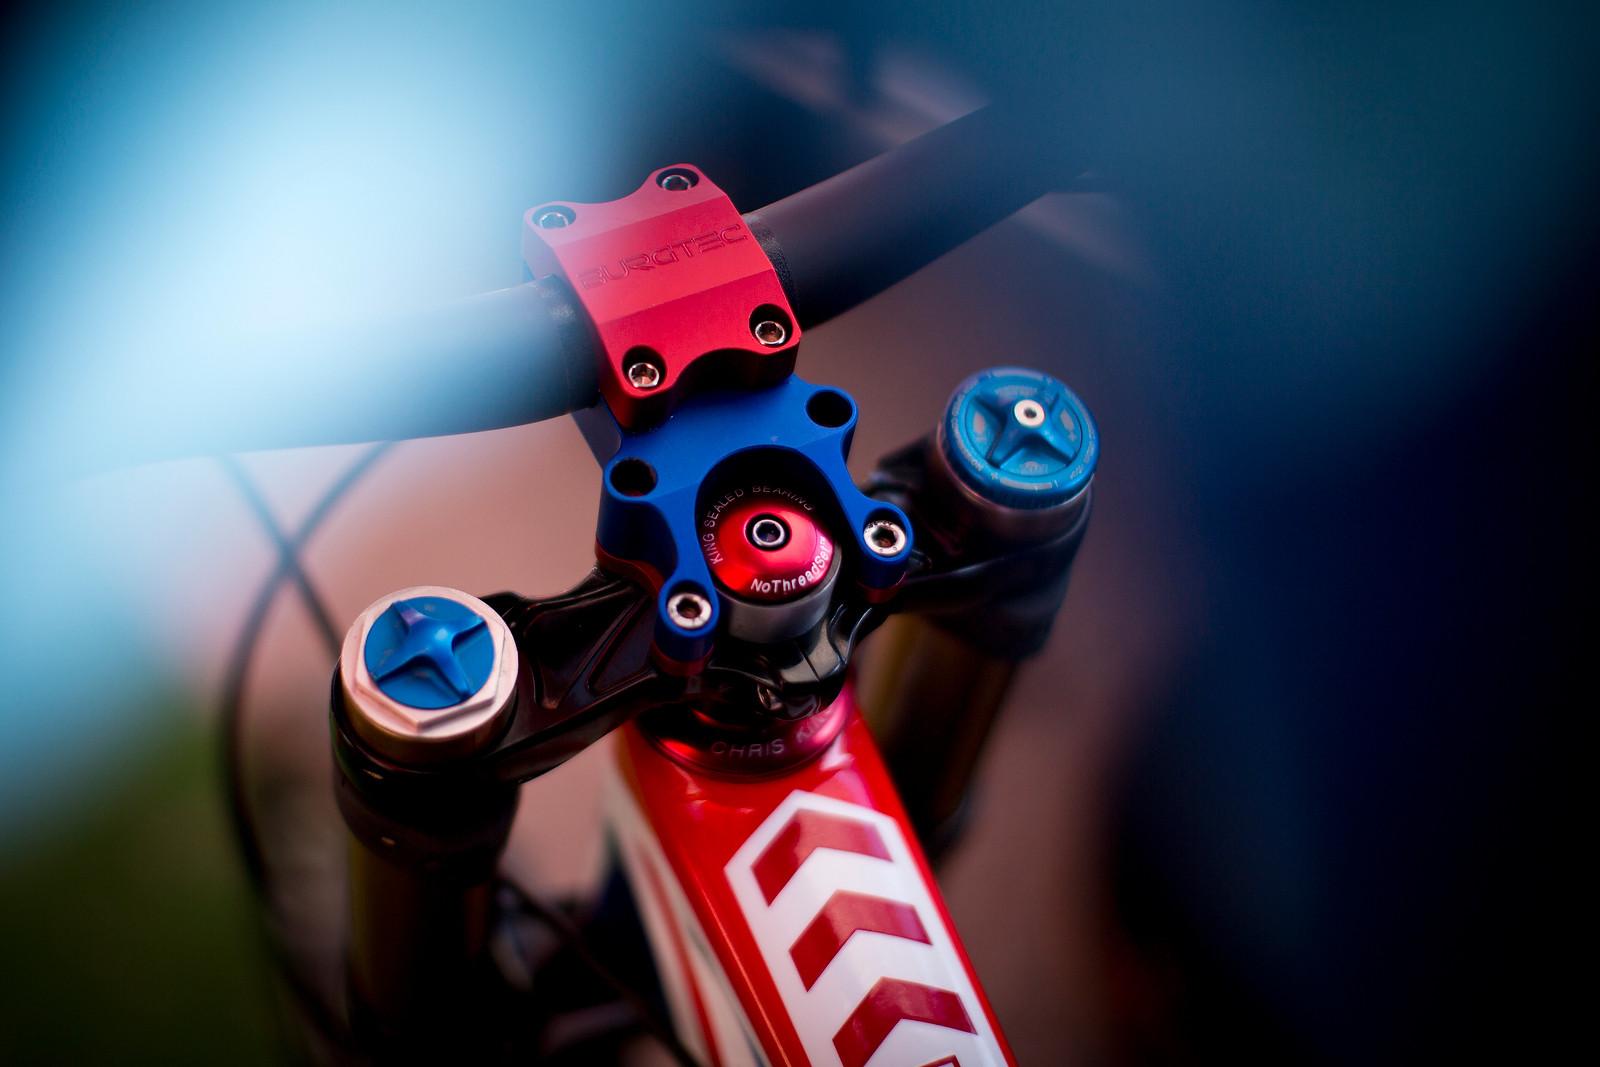 Steve Peat's World Champs Santa Cruz V10 with Burgtec Stem - New Kits and Gear for 2012 World Championships - Mountain Biking Pictures - Vital MTB